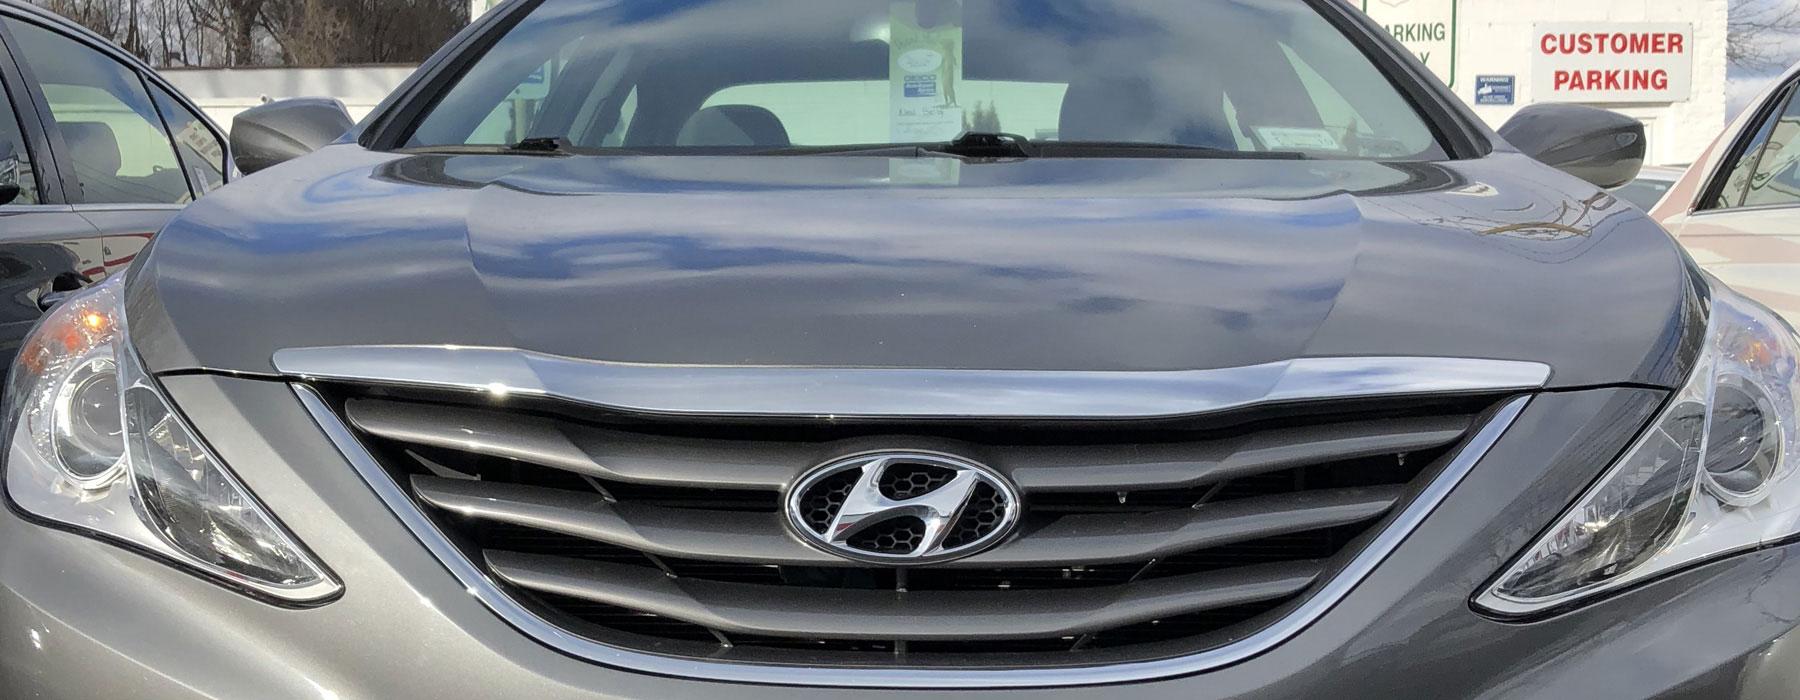 Certifications Hyundai